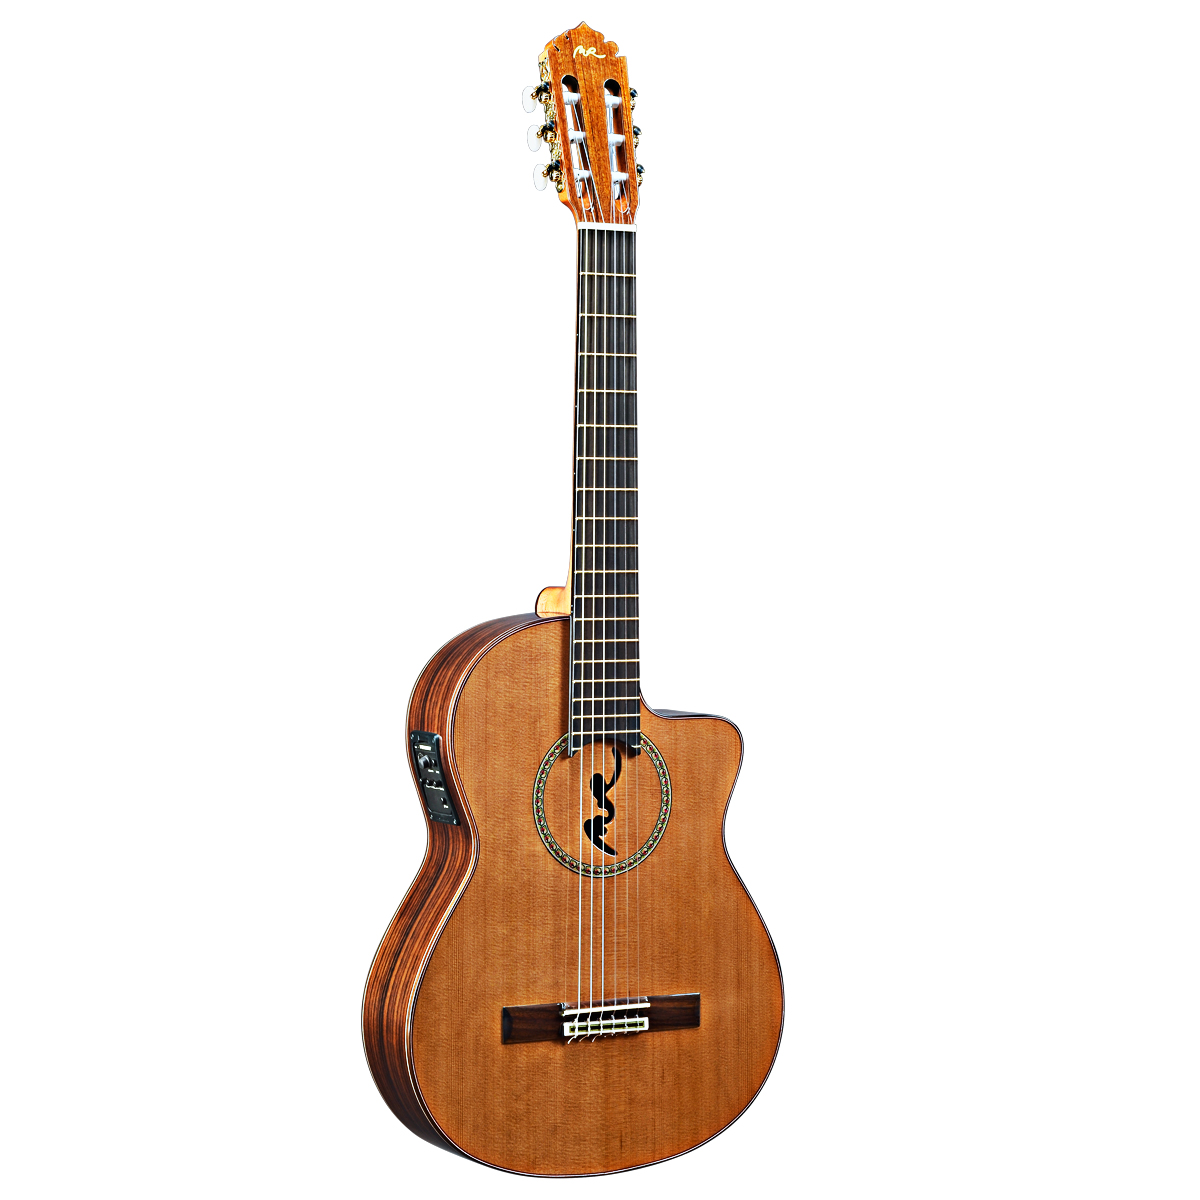 Manuel Rodriguez B Cutaway S S klasikinė gitara